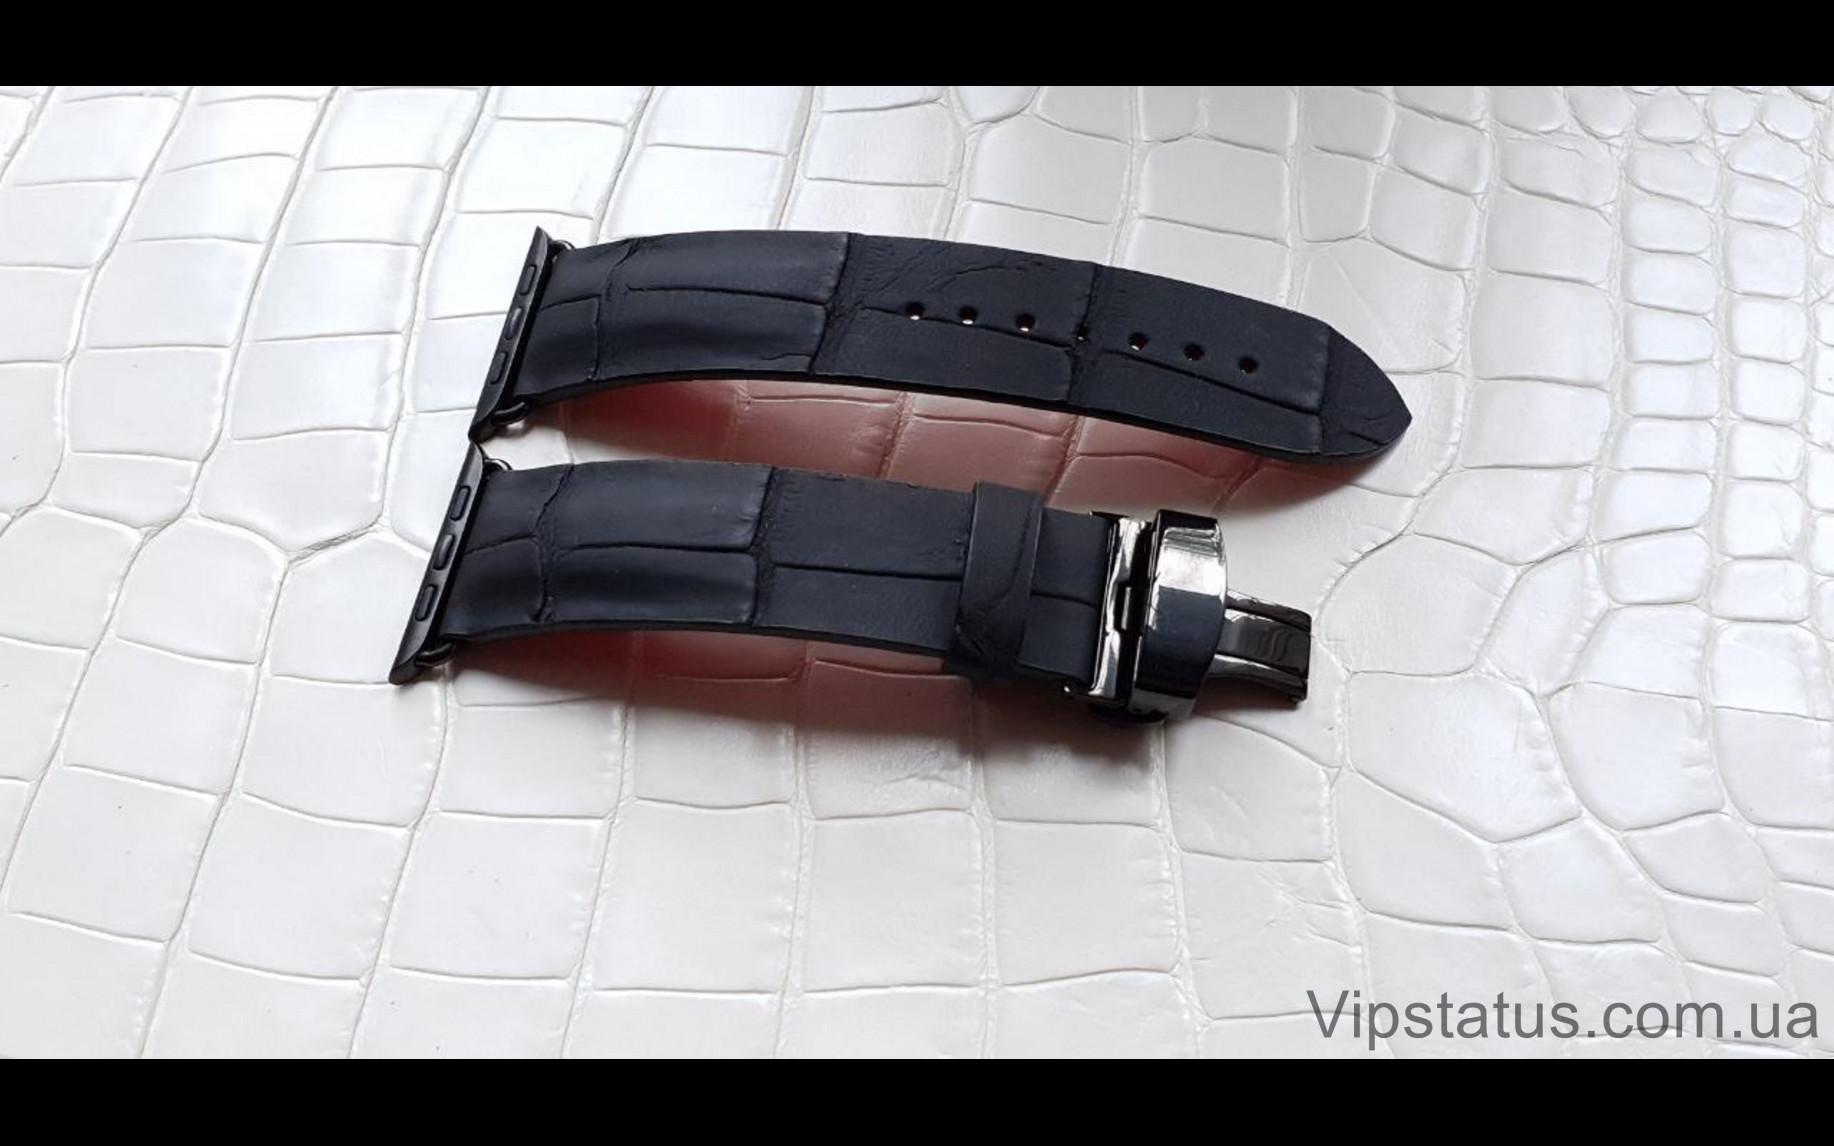 Elite Премиум ремешок для часов Montblanc кожа крокодила Premium Crocodile Strap for Montblanc watches image 3